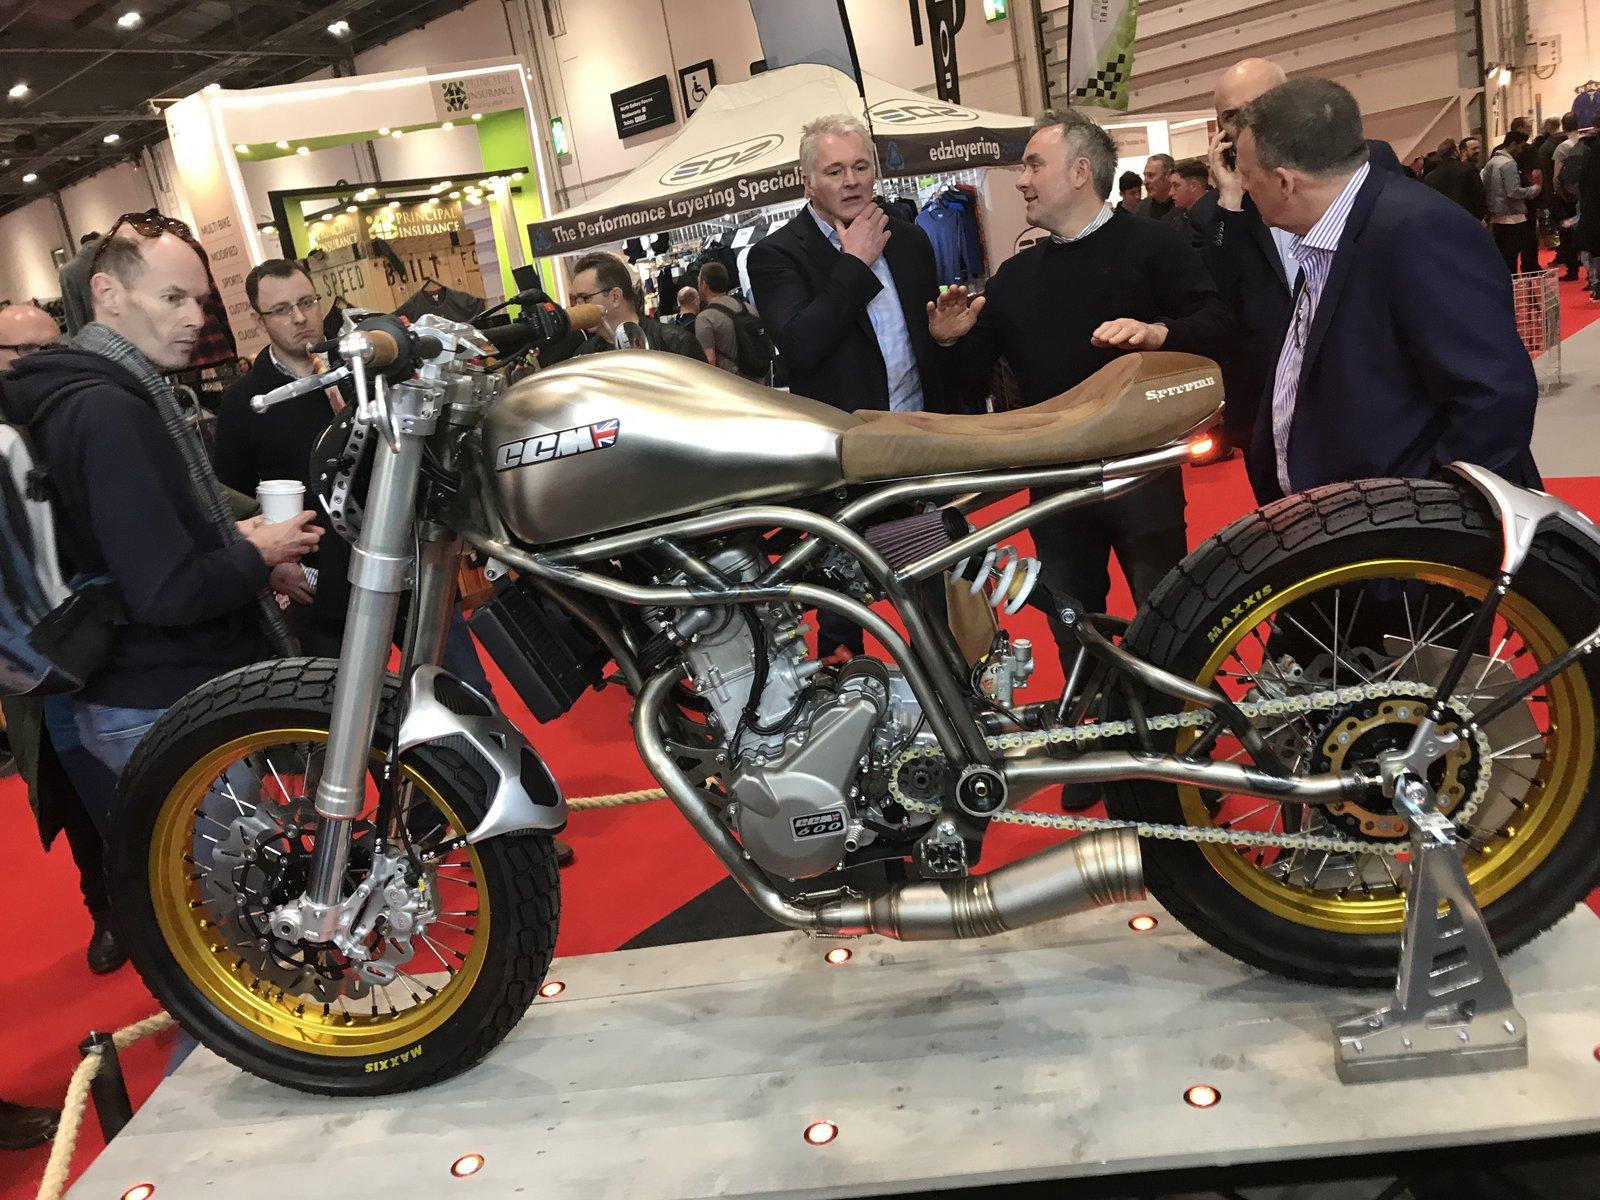 New Ccm Spitfire Scrambler   Page 3   Ducati Forum